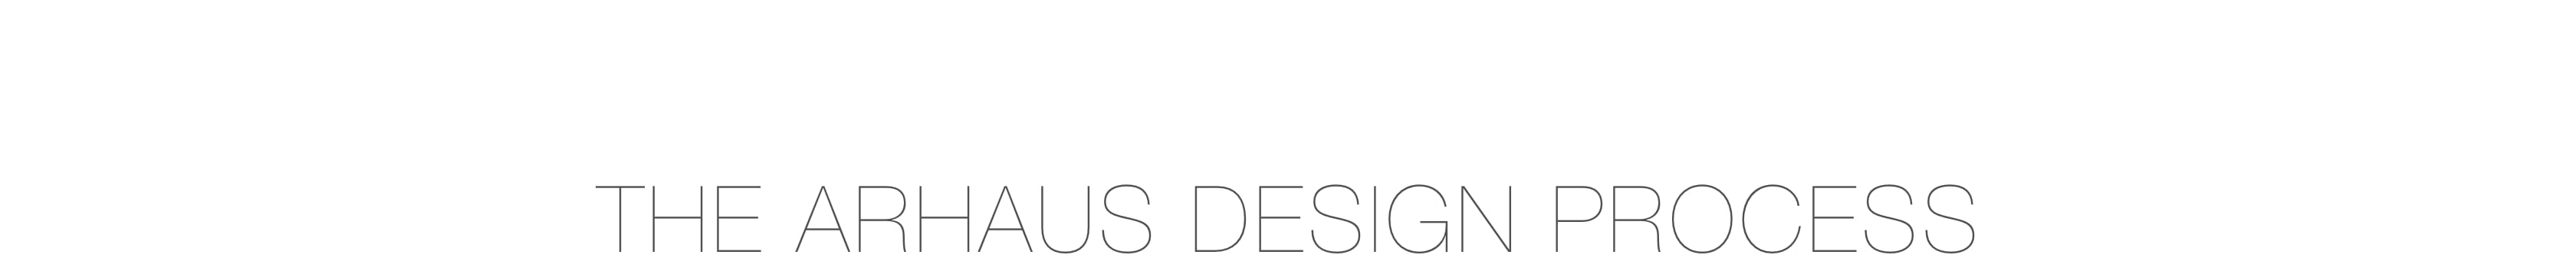 The Arhaus Design Process